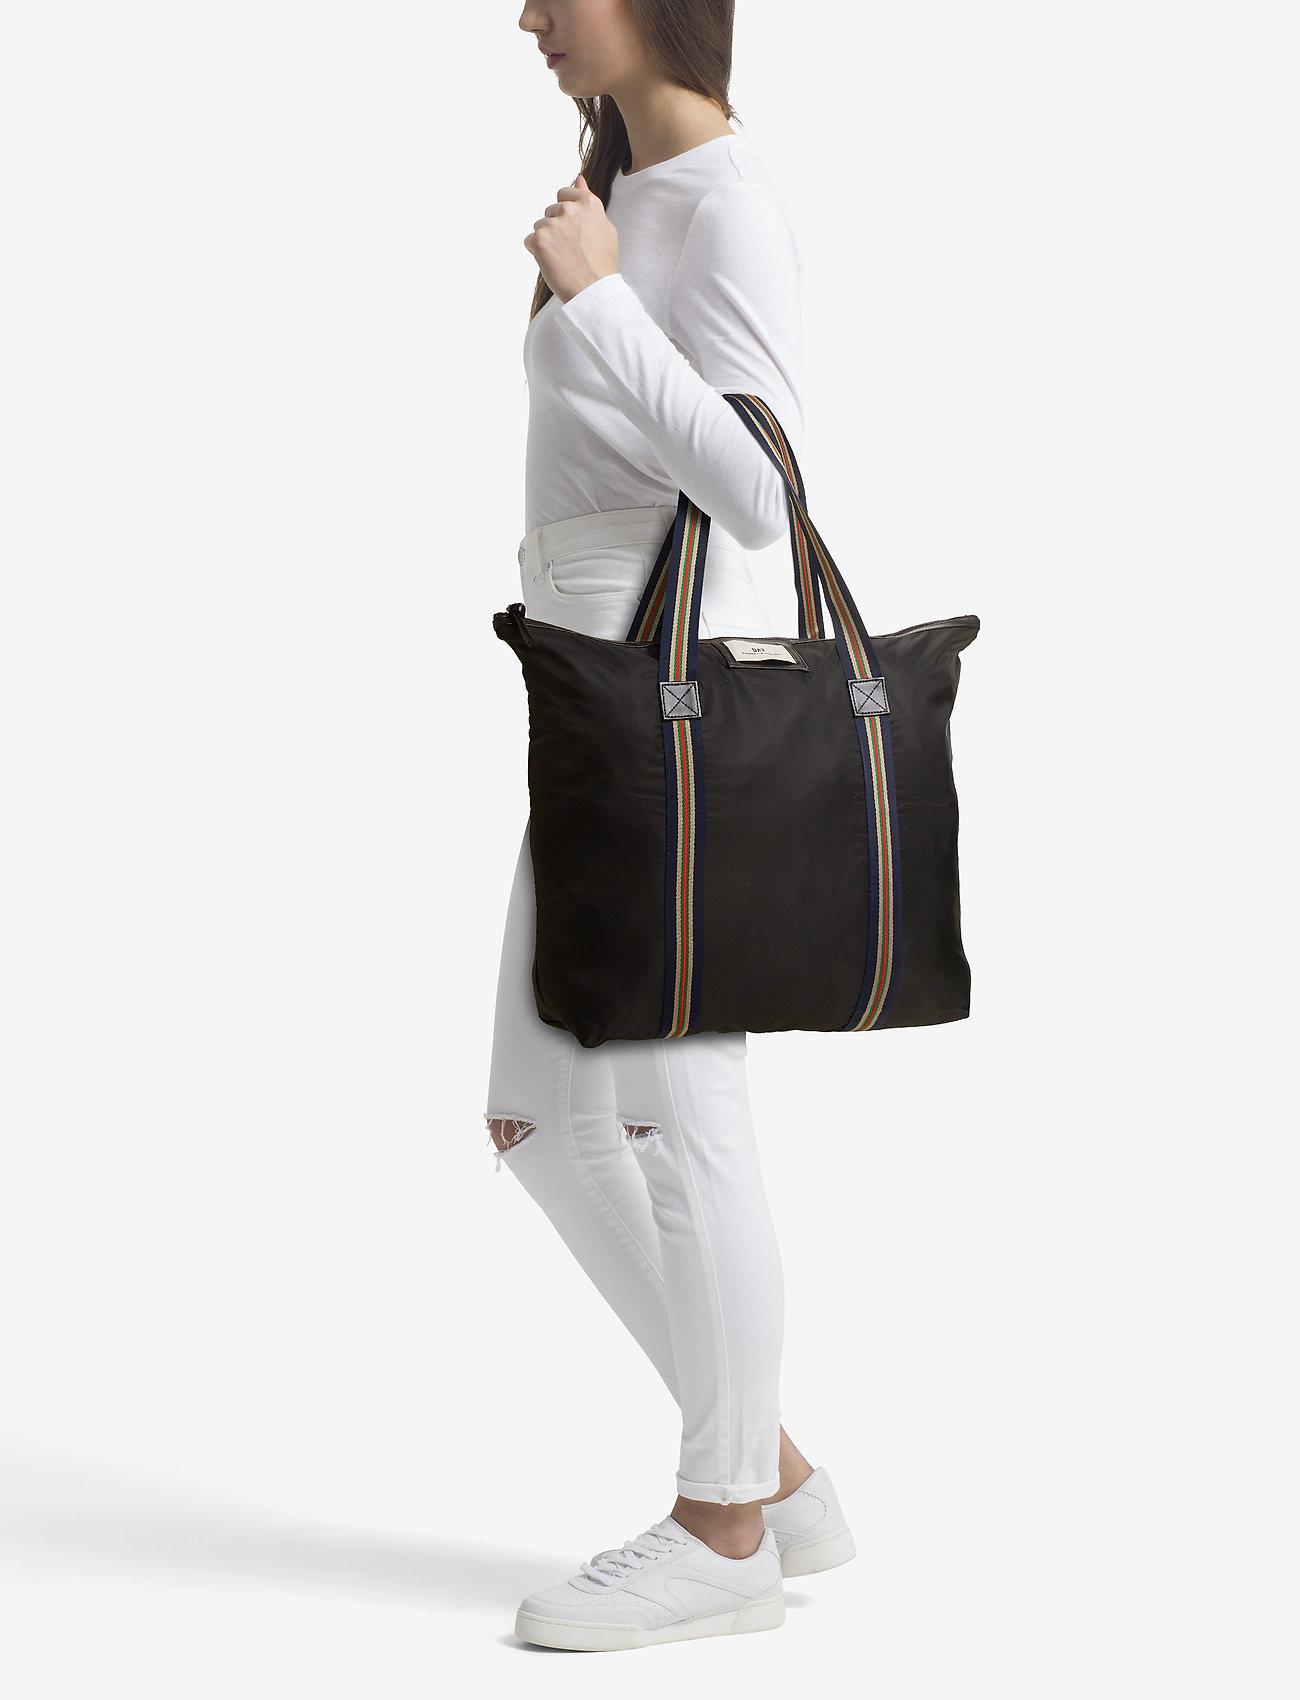 DAY et Day Gweneth Prep Bag   Shoppers